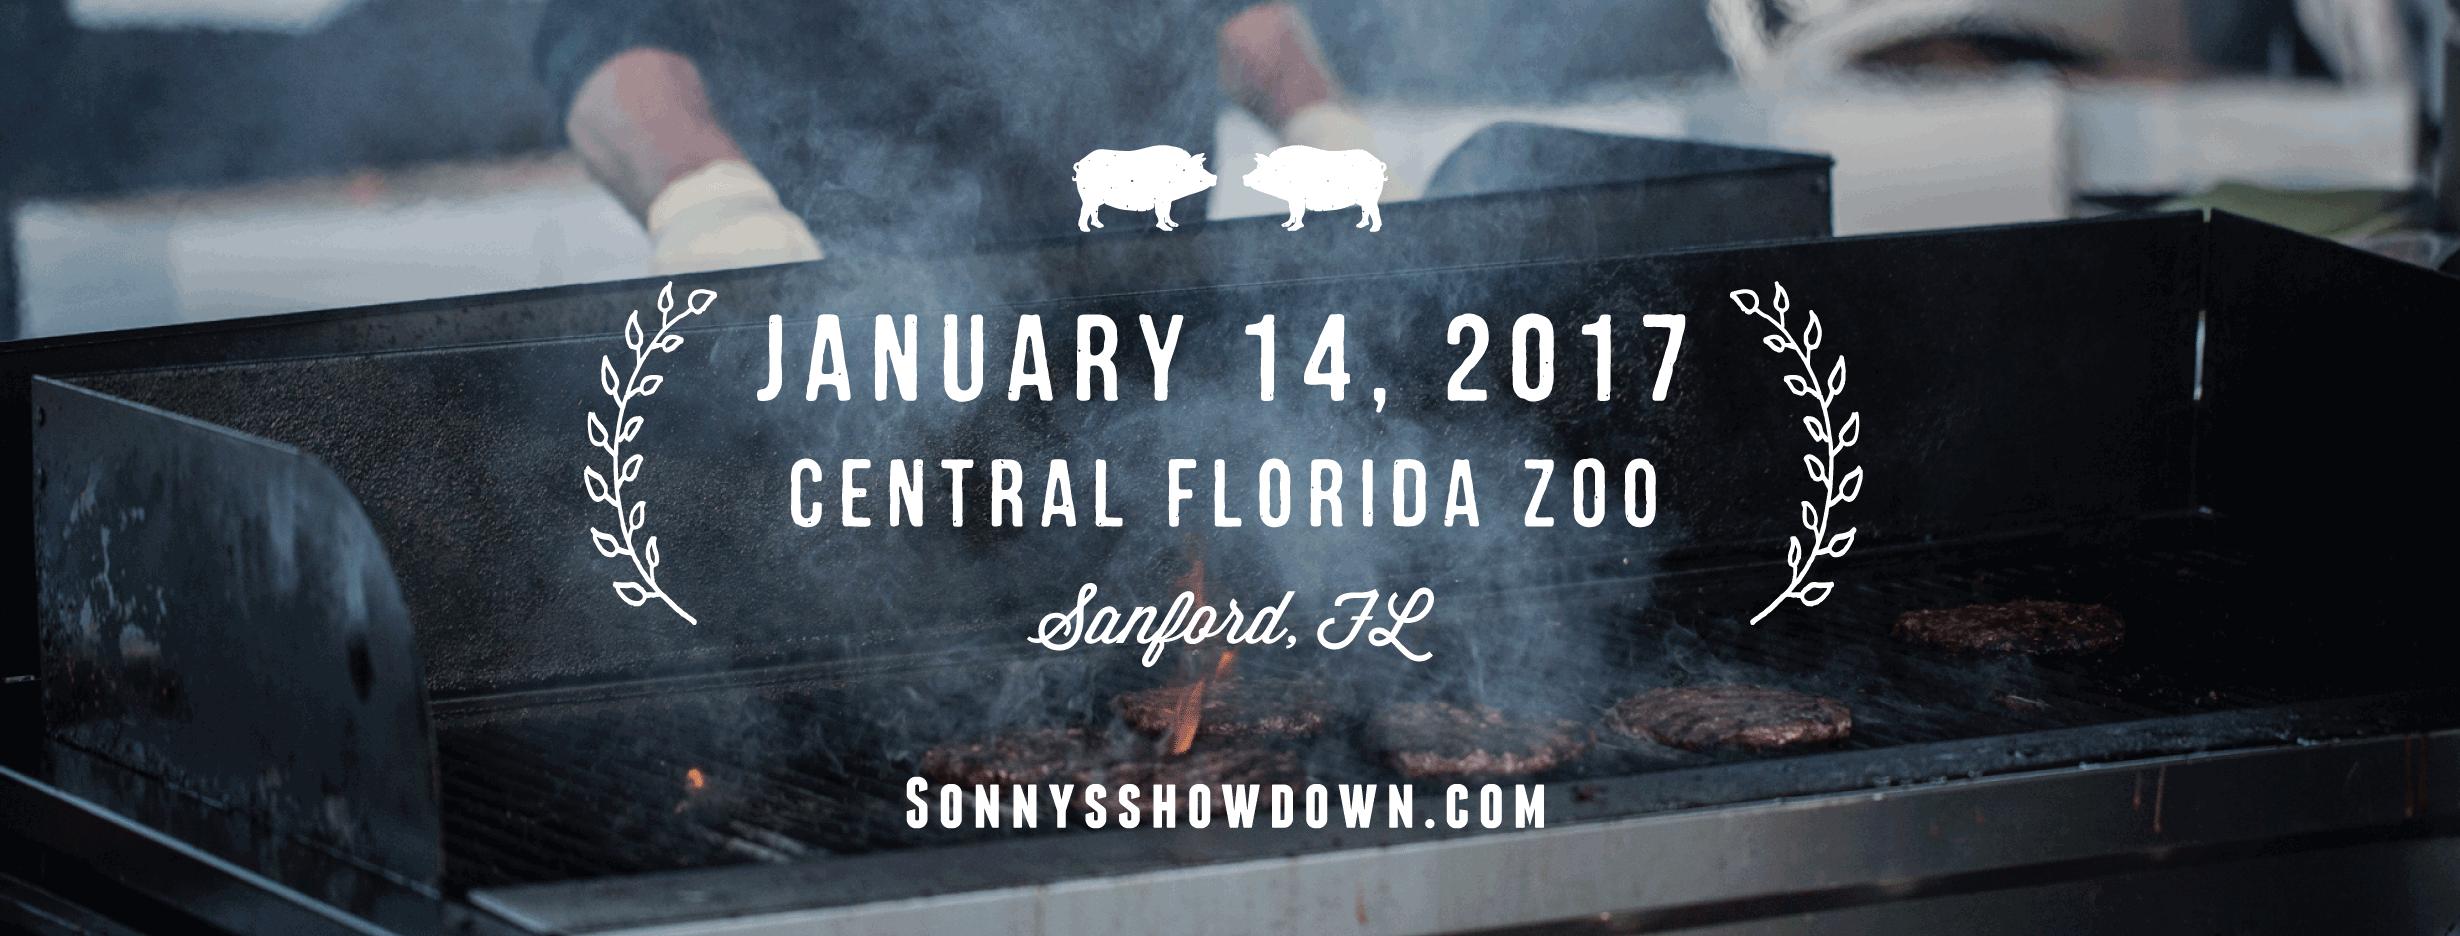 Sonny's Will Host the Showdown Invitational BBQ